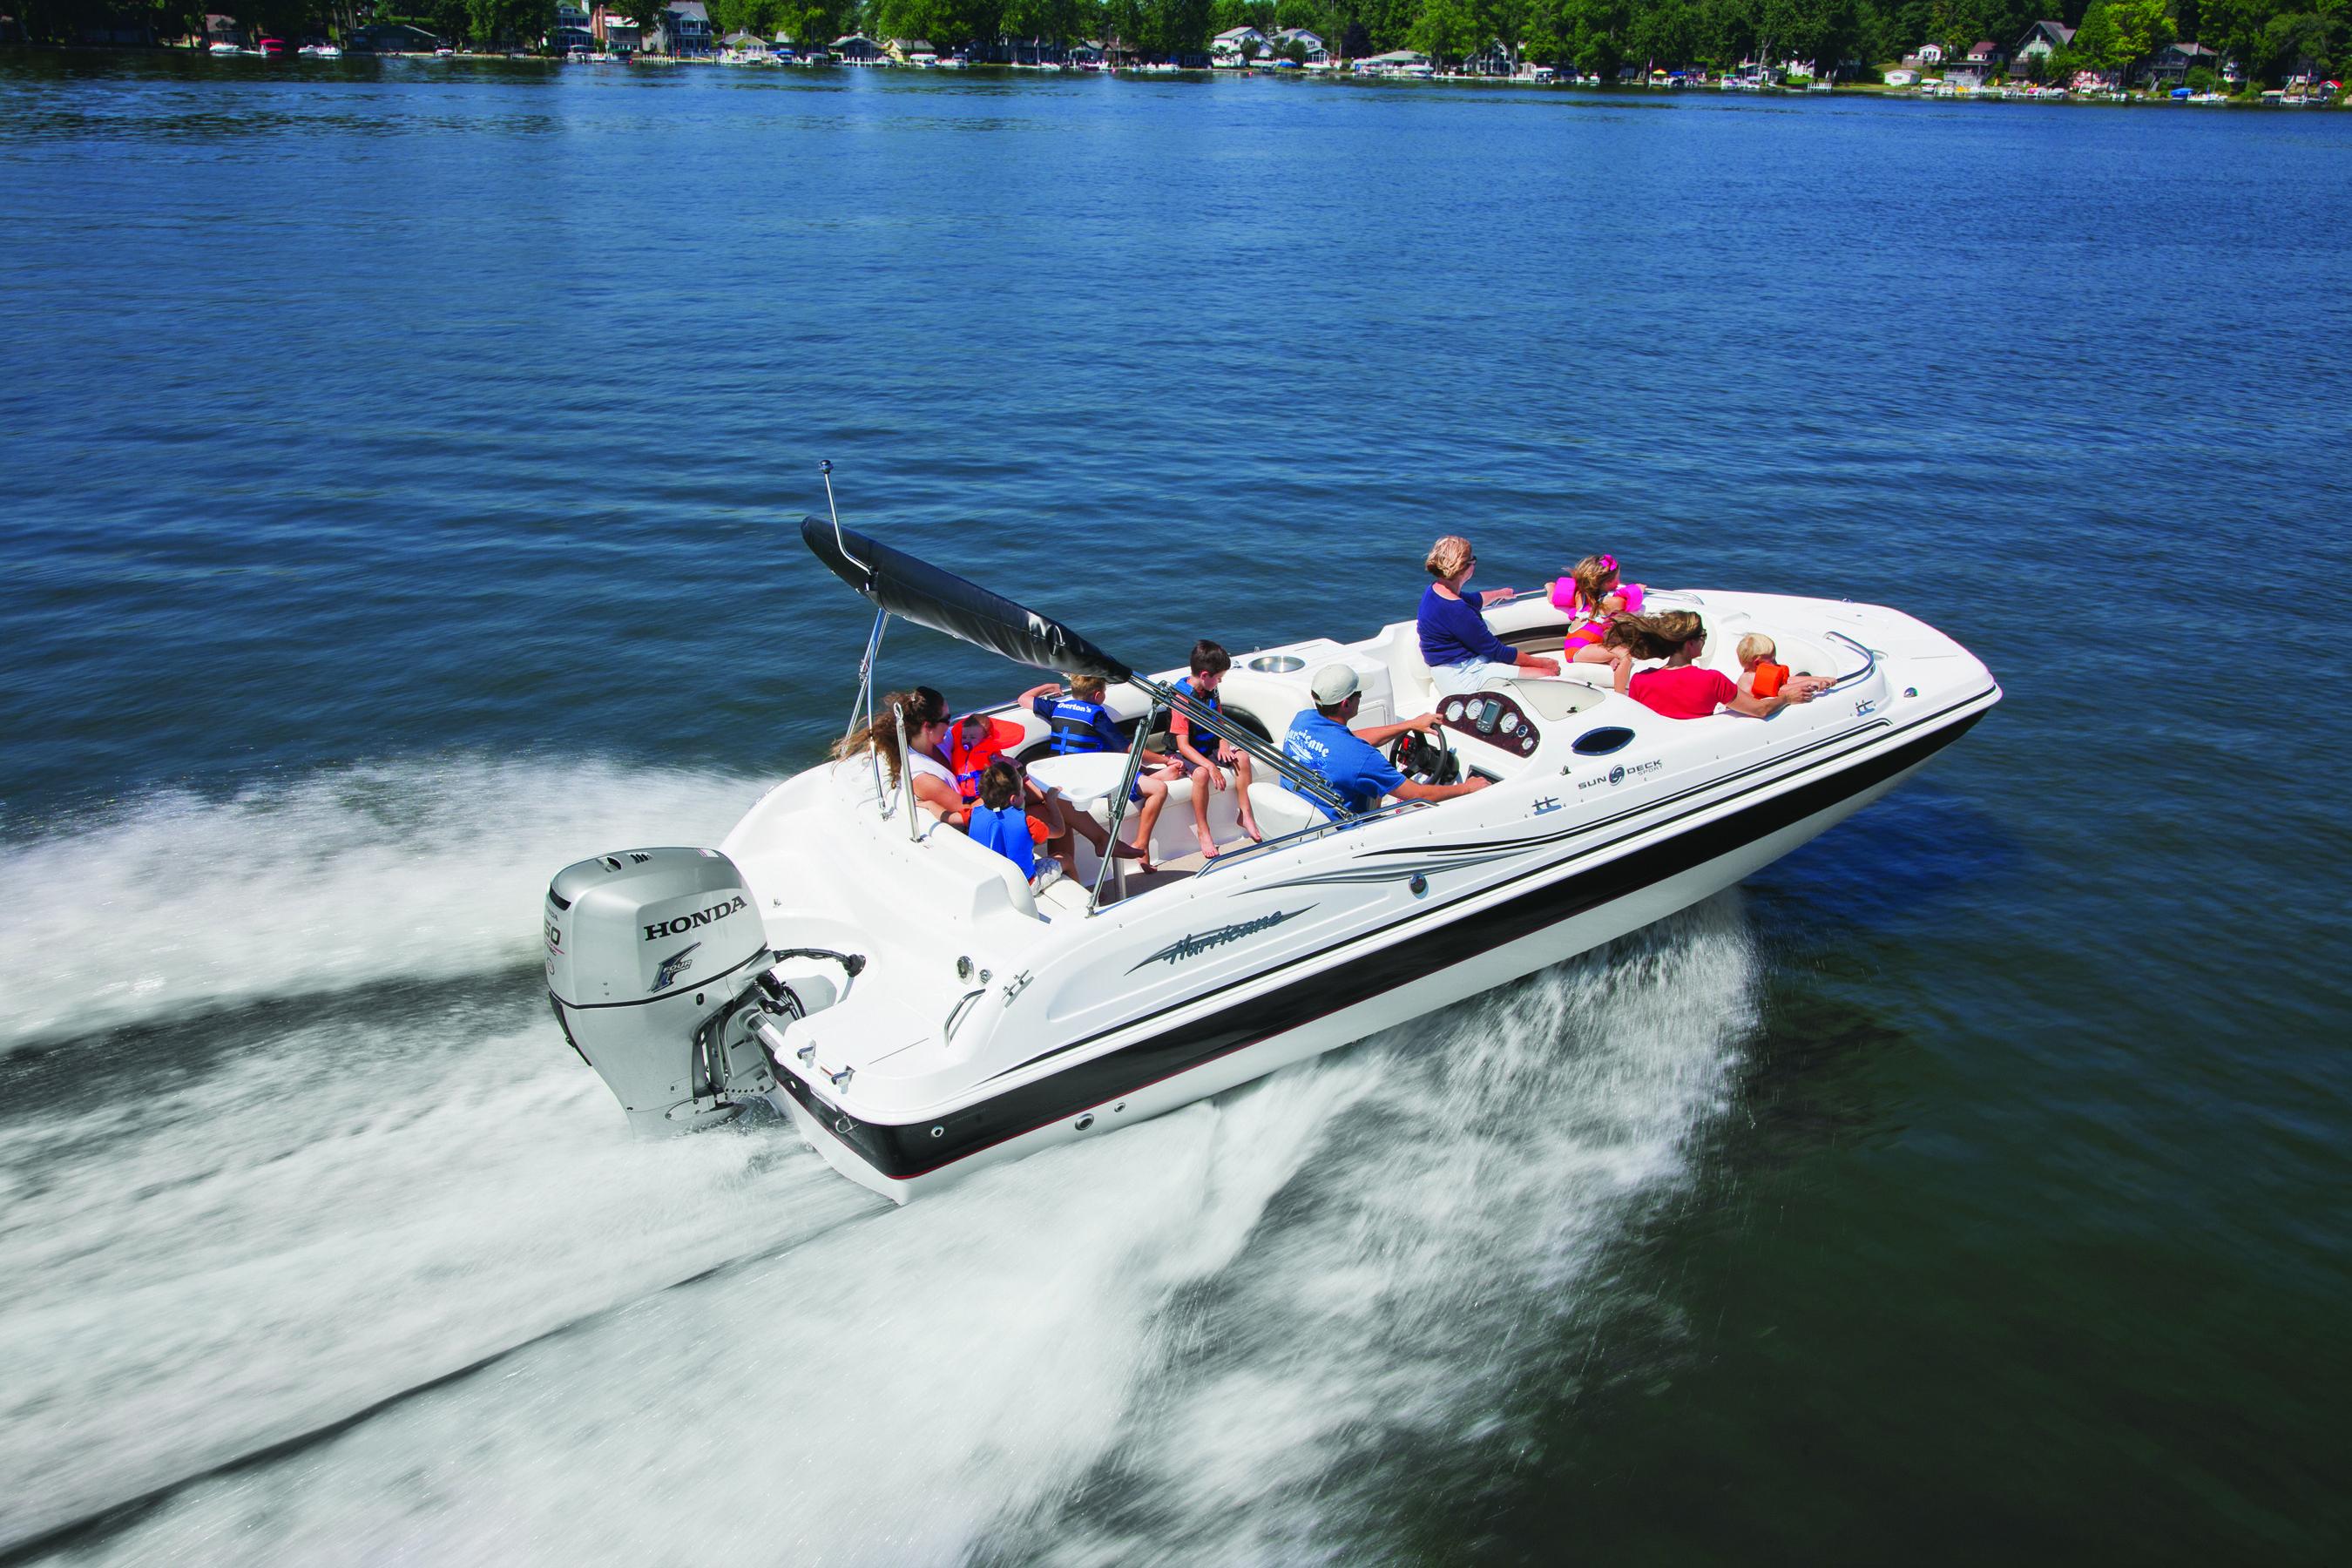 Pin On Hurricane Sundeck Sport Outboard Models